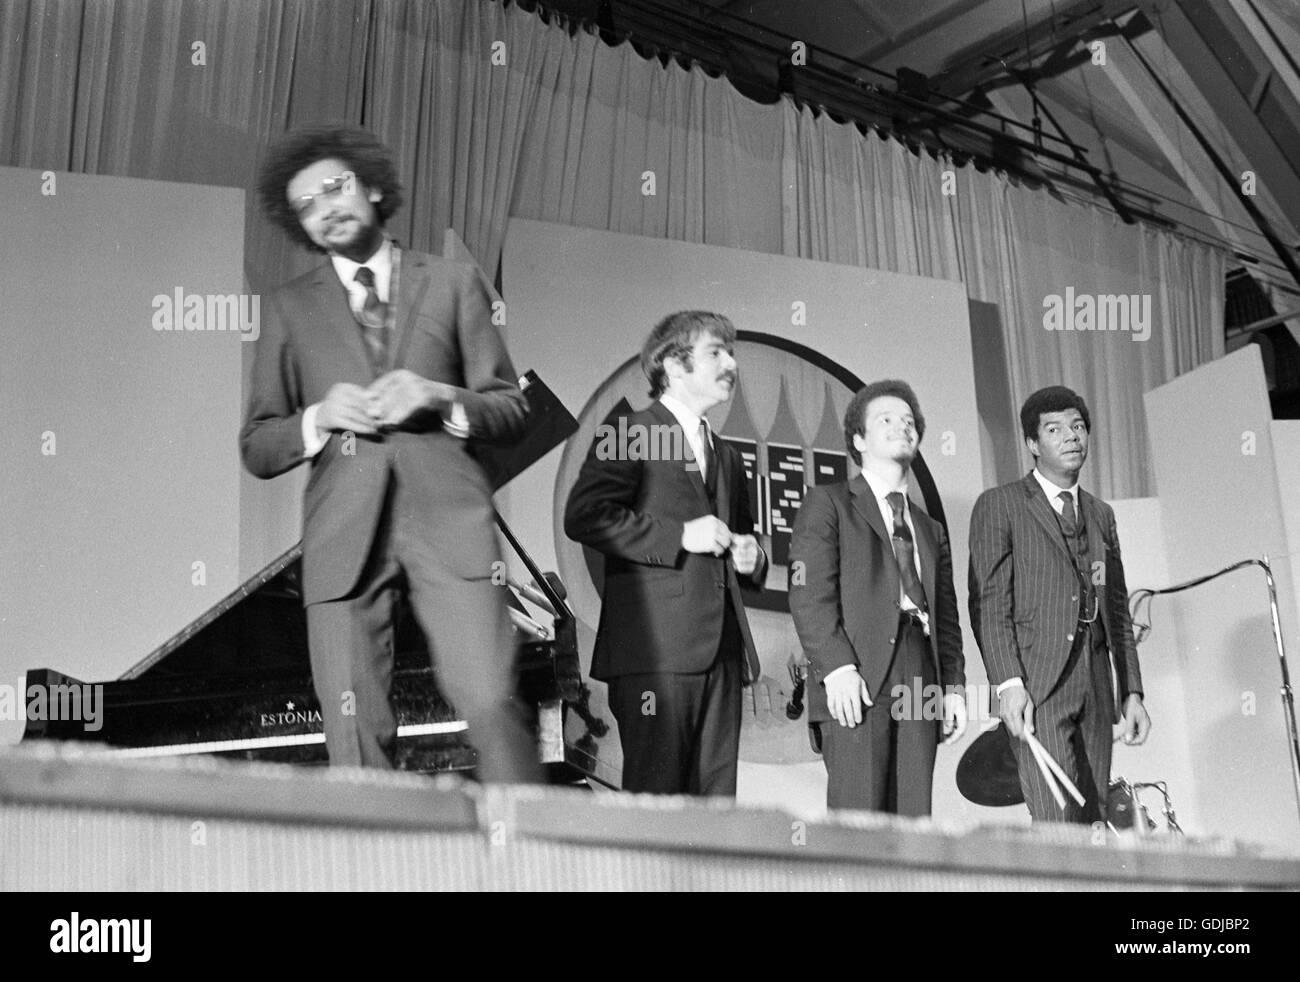 Charles Lloyd, Keith Jarrett, Jack DeJohnette, and Ron McClure - Stock Image